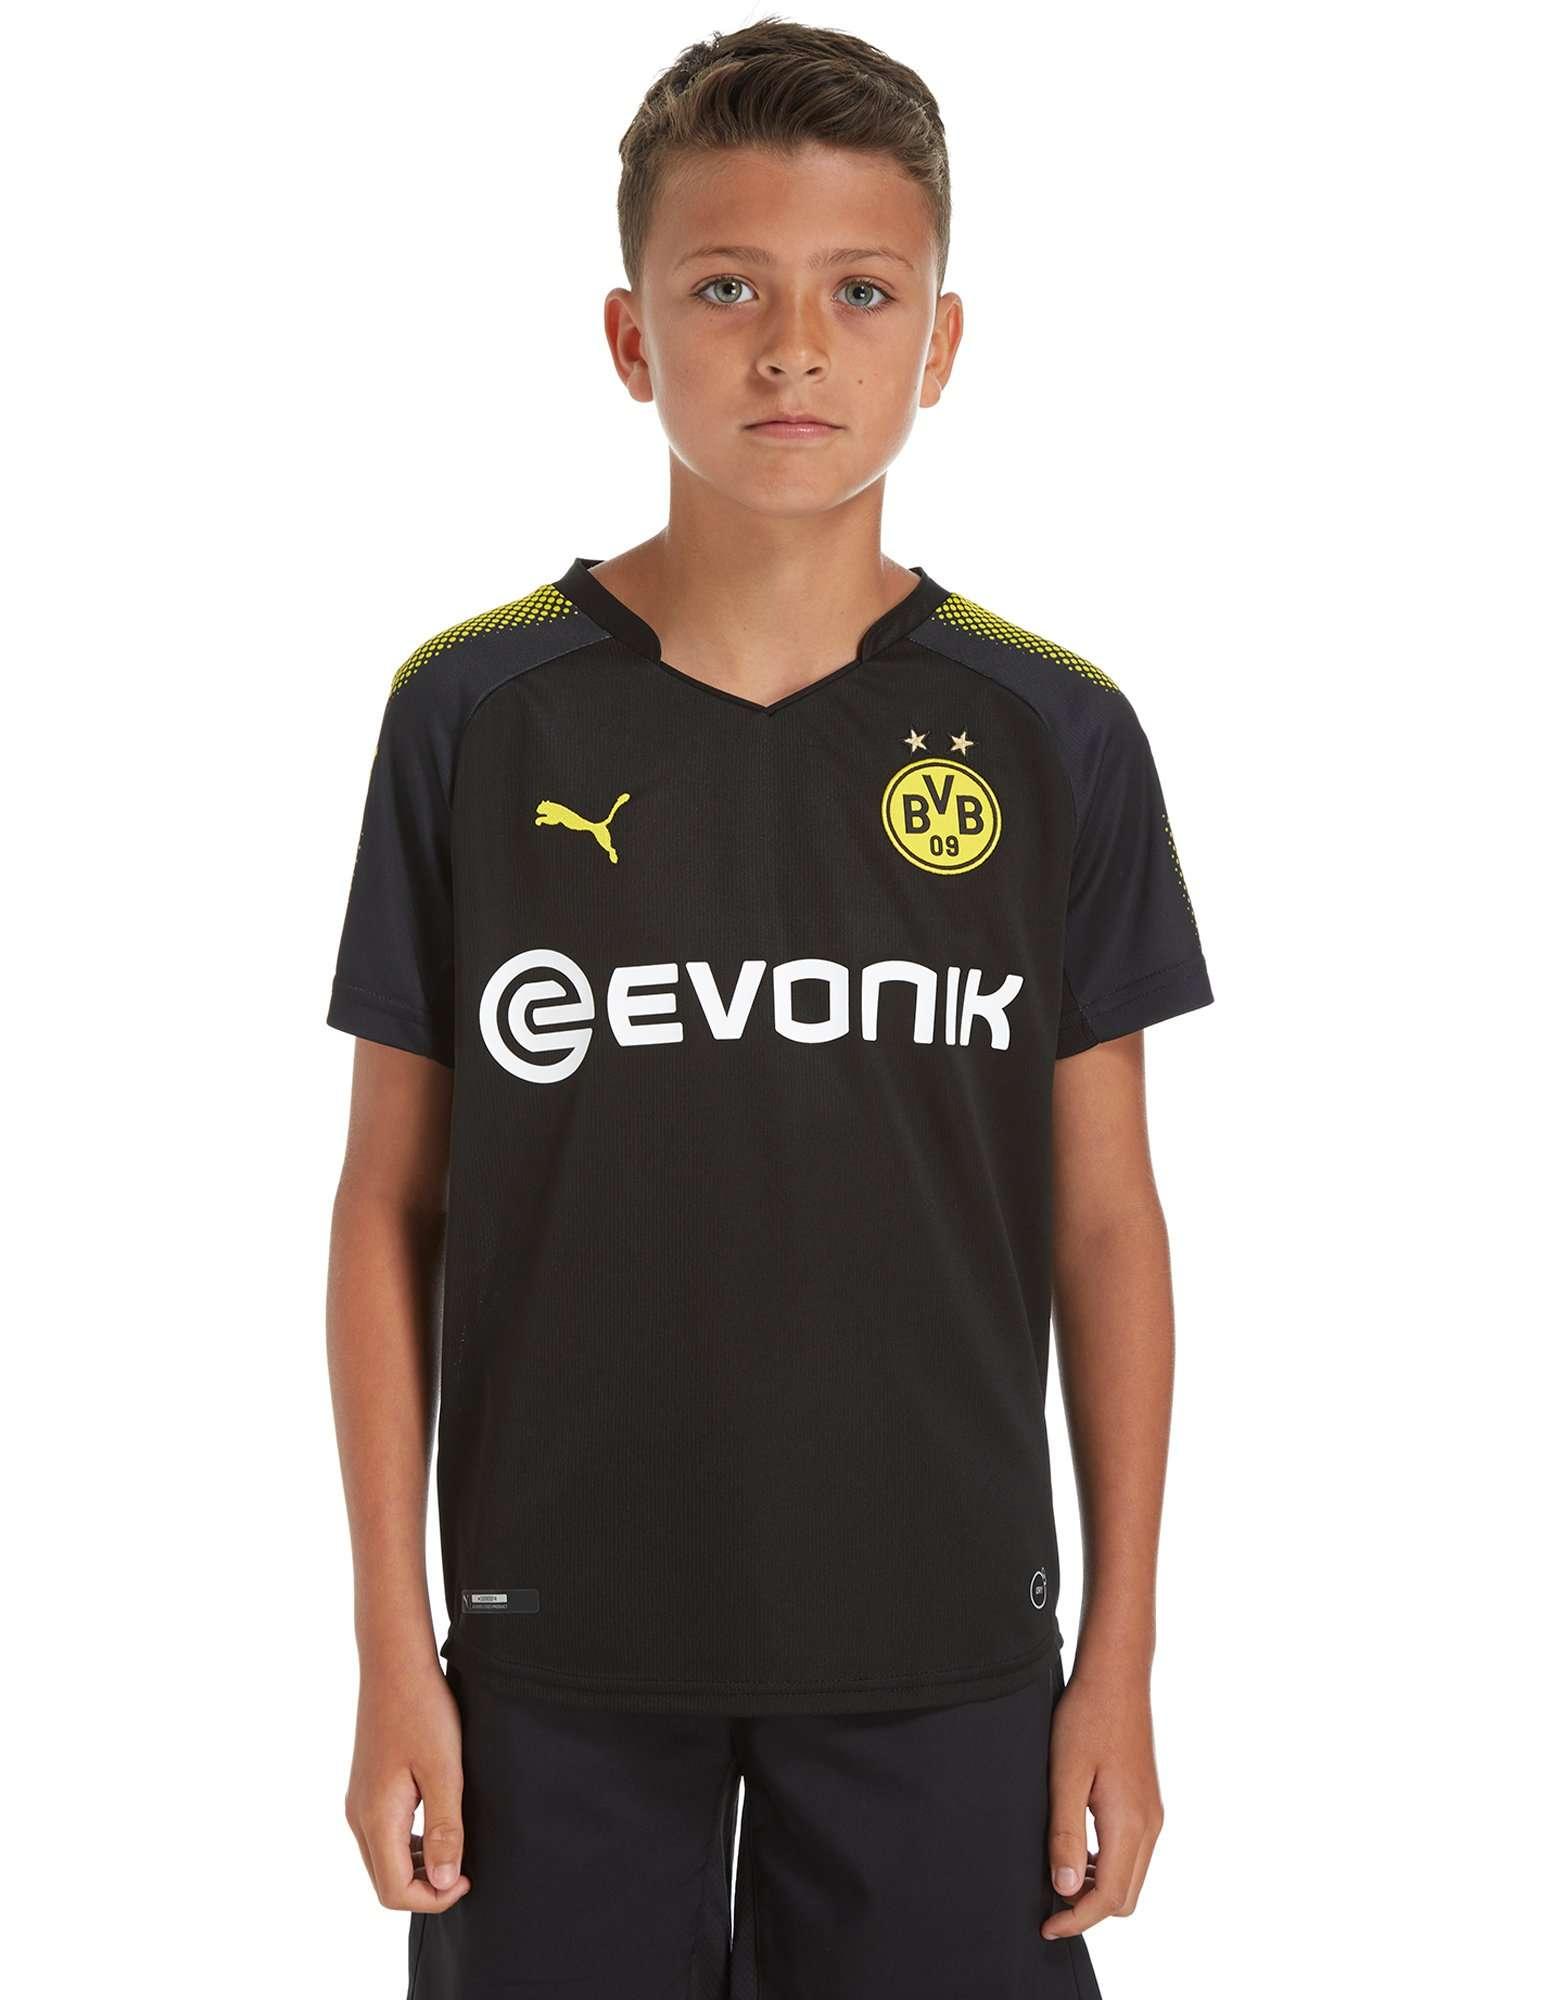 PUMA Maillot Junior Borussia Dortmund 2017/18